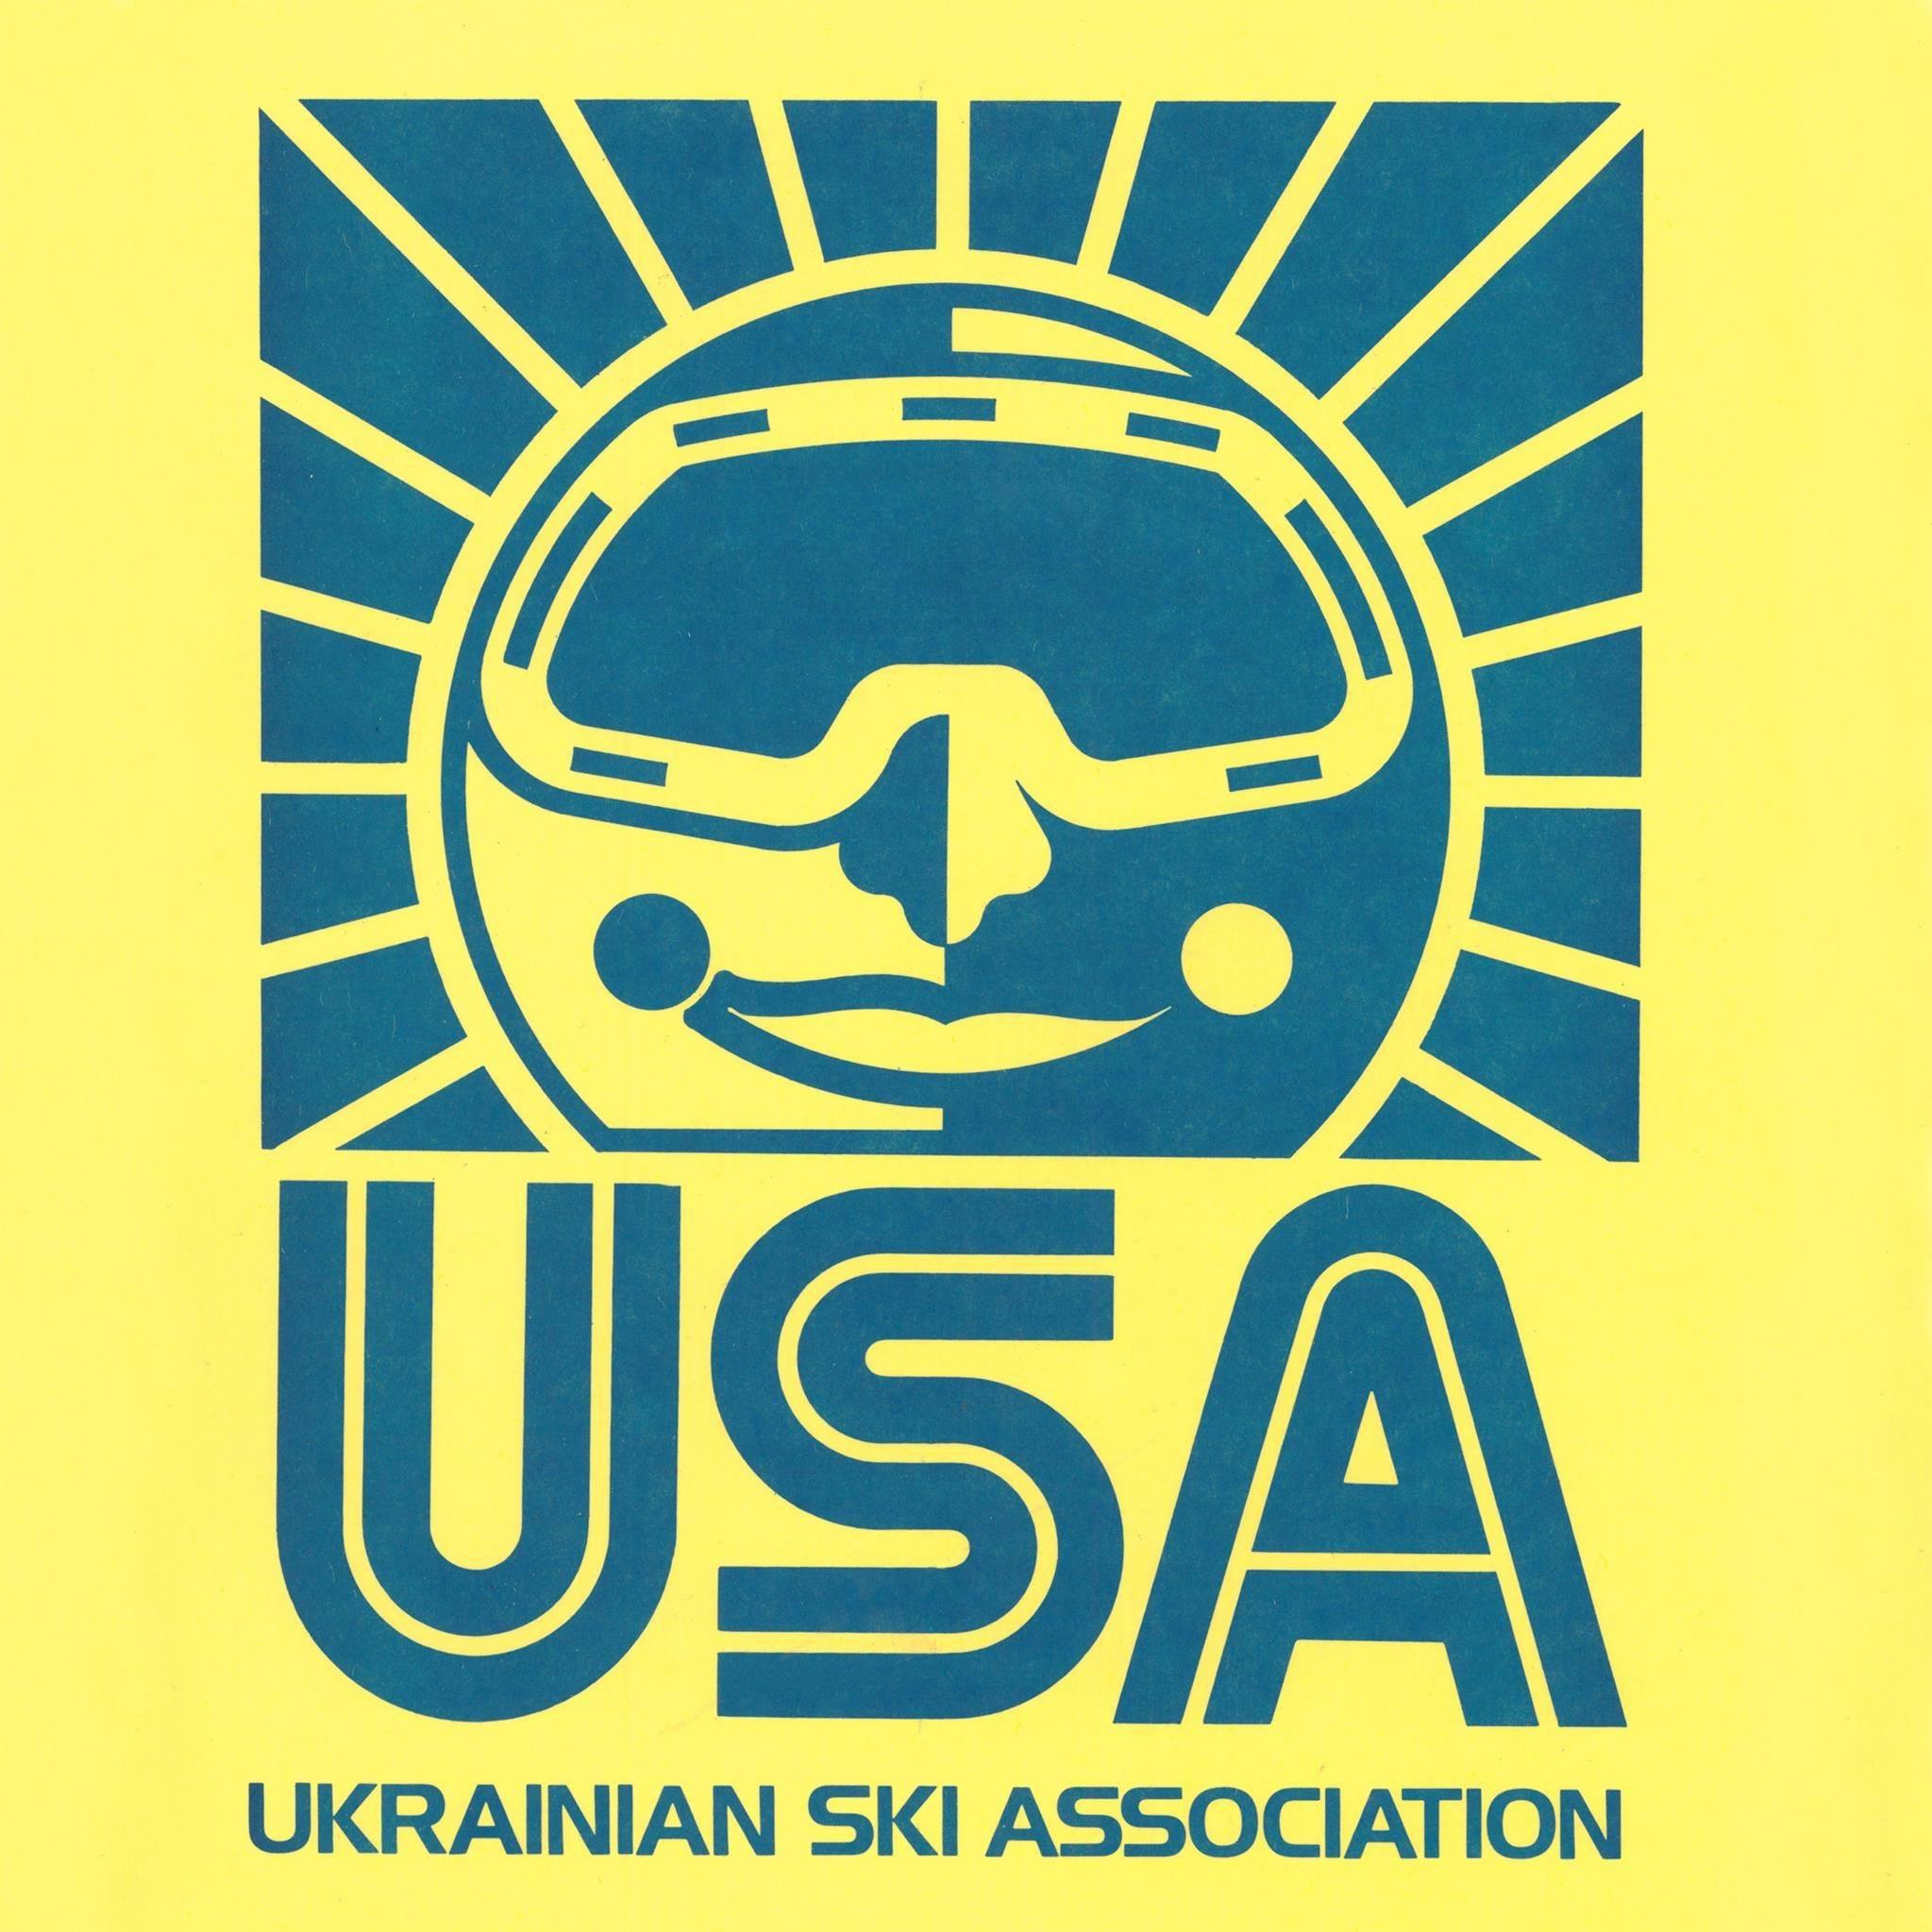 Ukrainian Ski Association